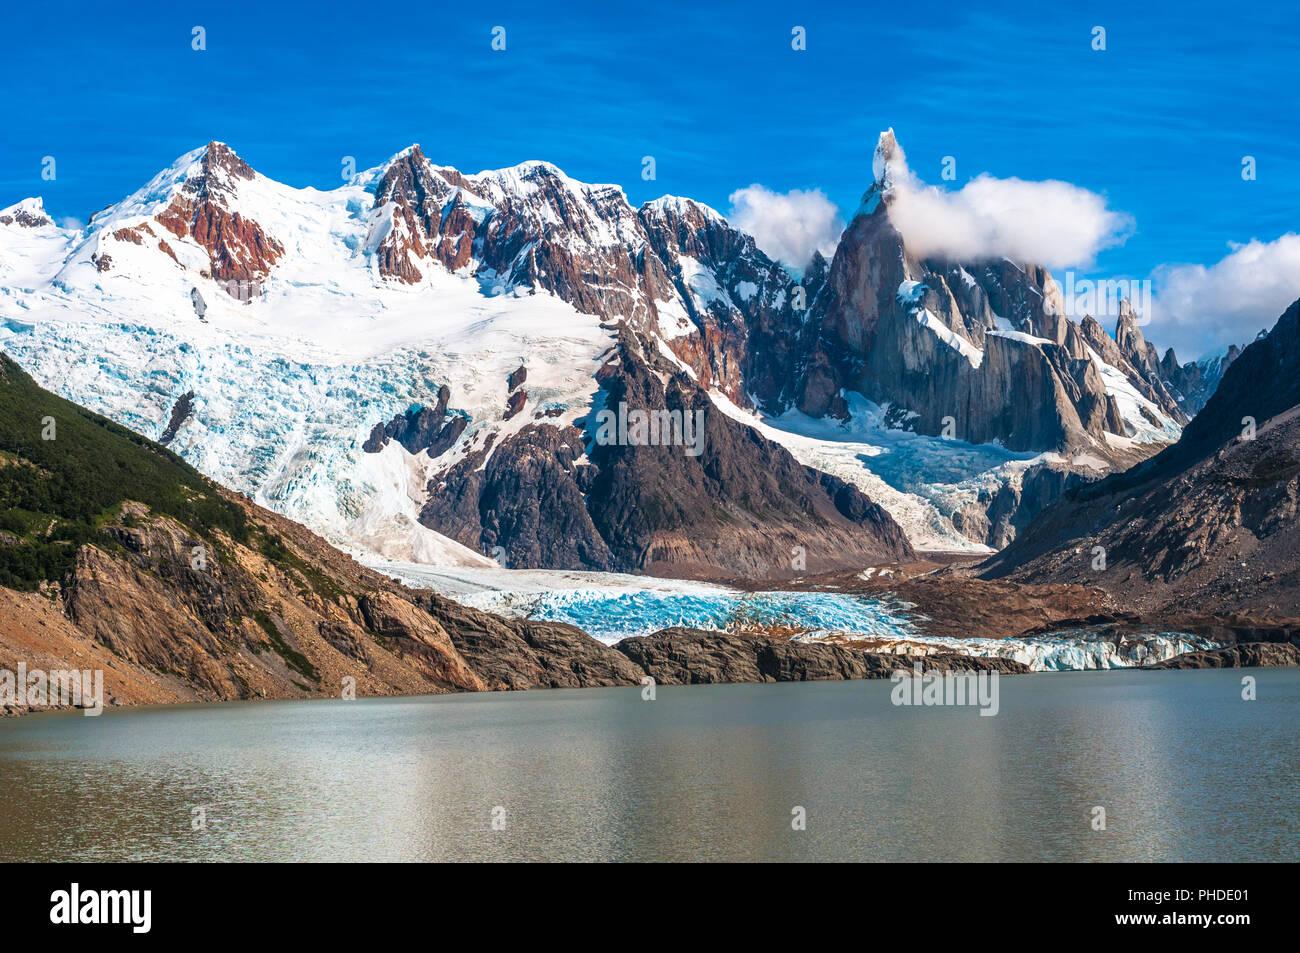 Cerro Torre montaña, Patagonia, Argentina Imagen De Stock